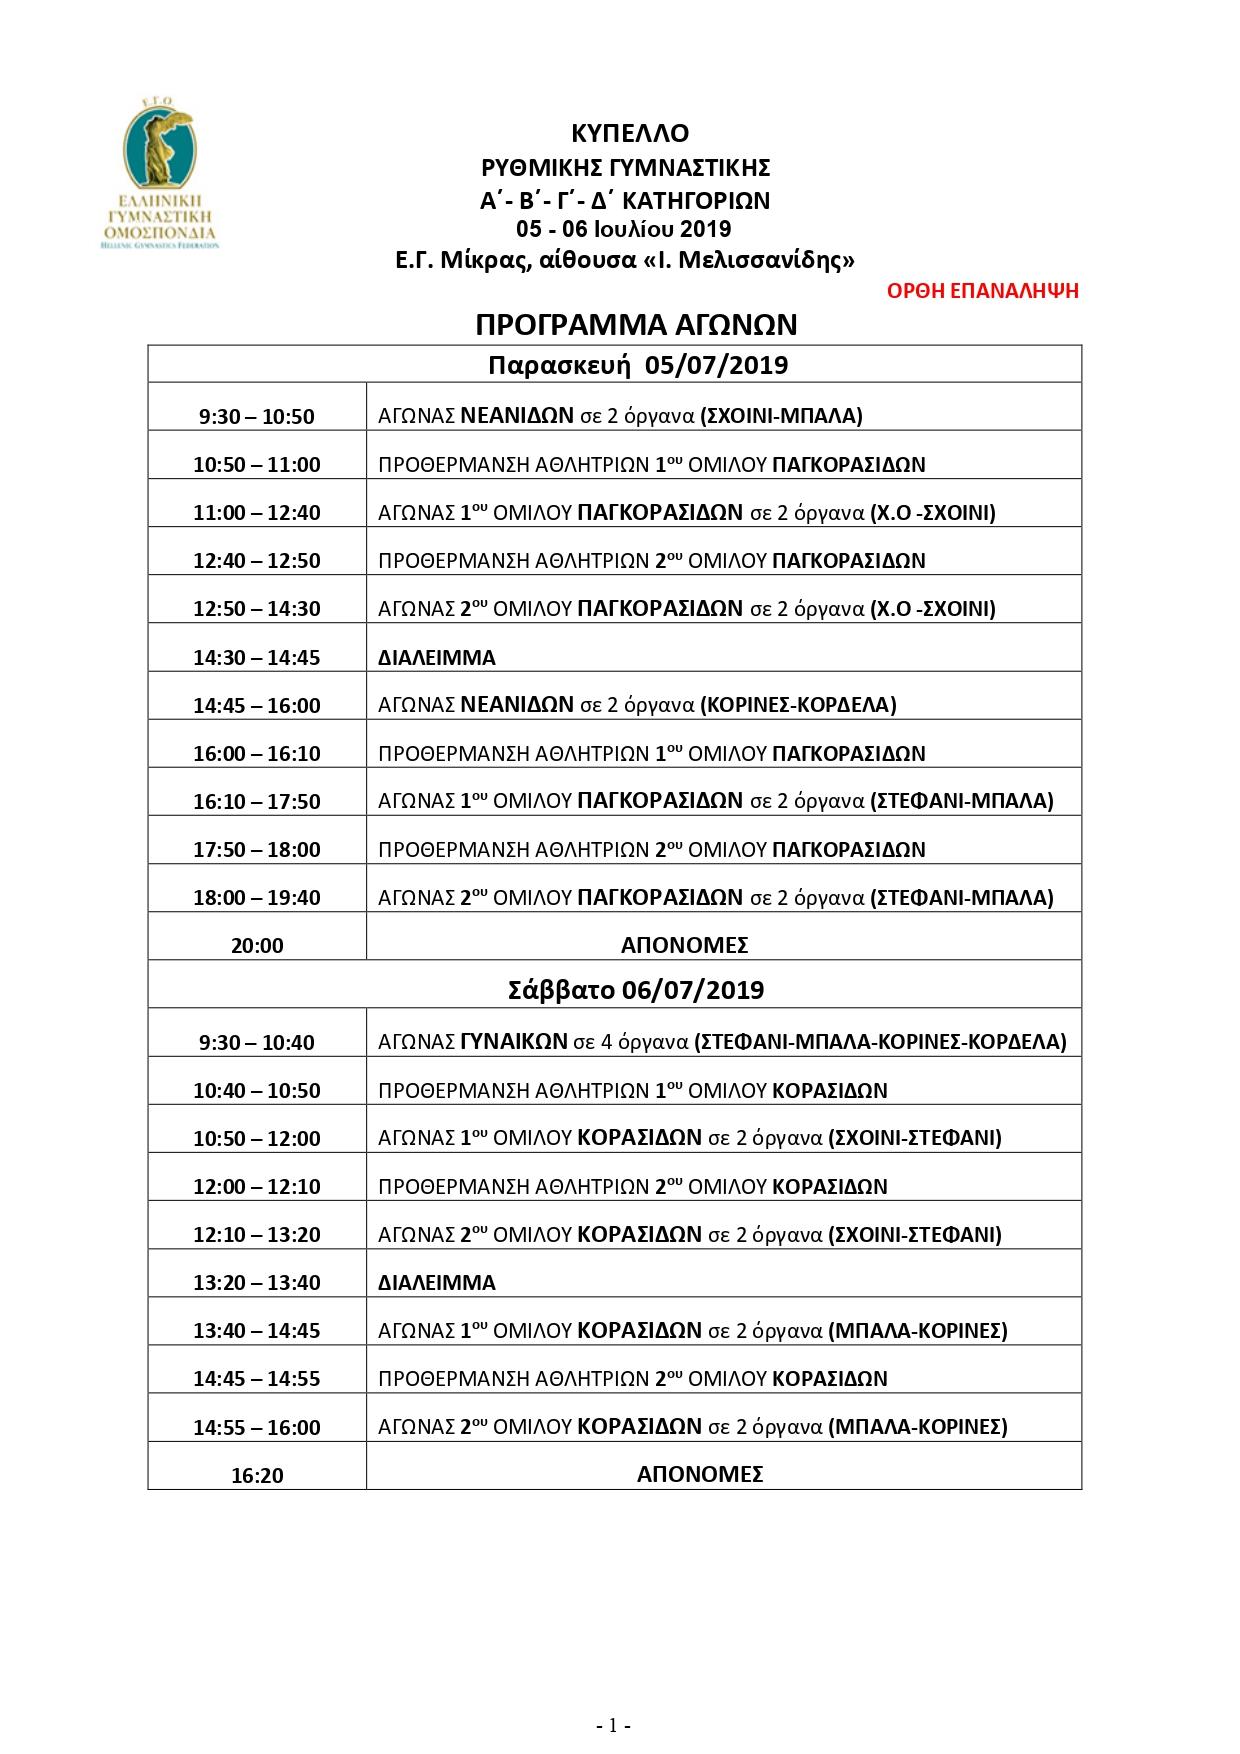 RG-Programma-Kypello-2019_upd_page-0001